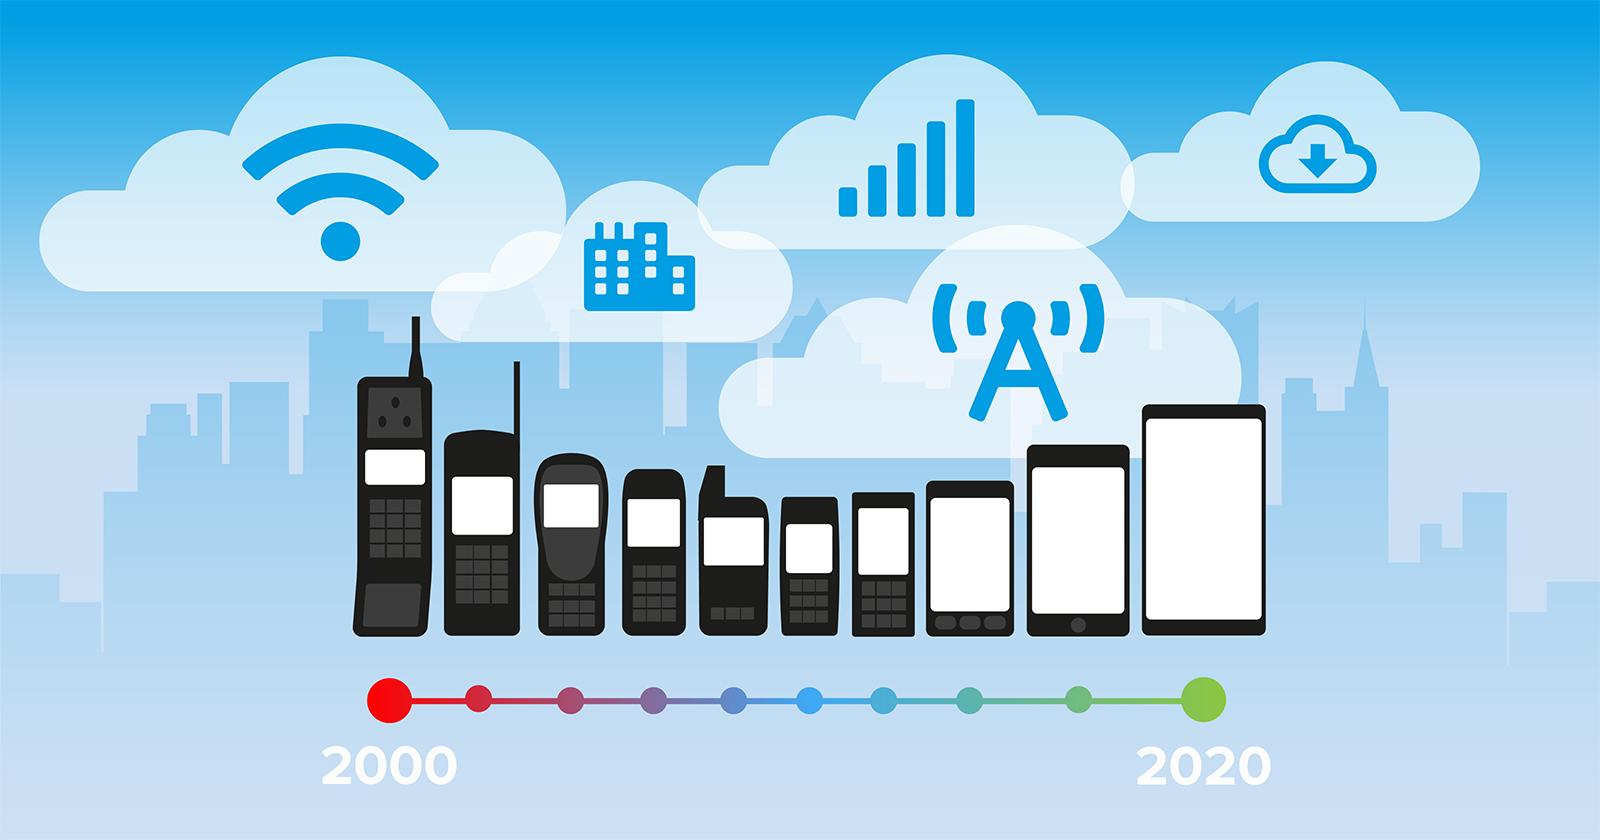 The mobile evolution